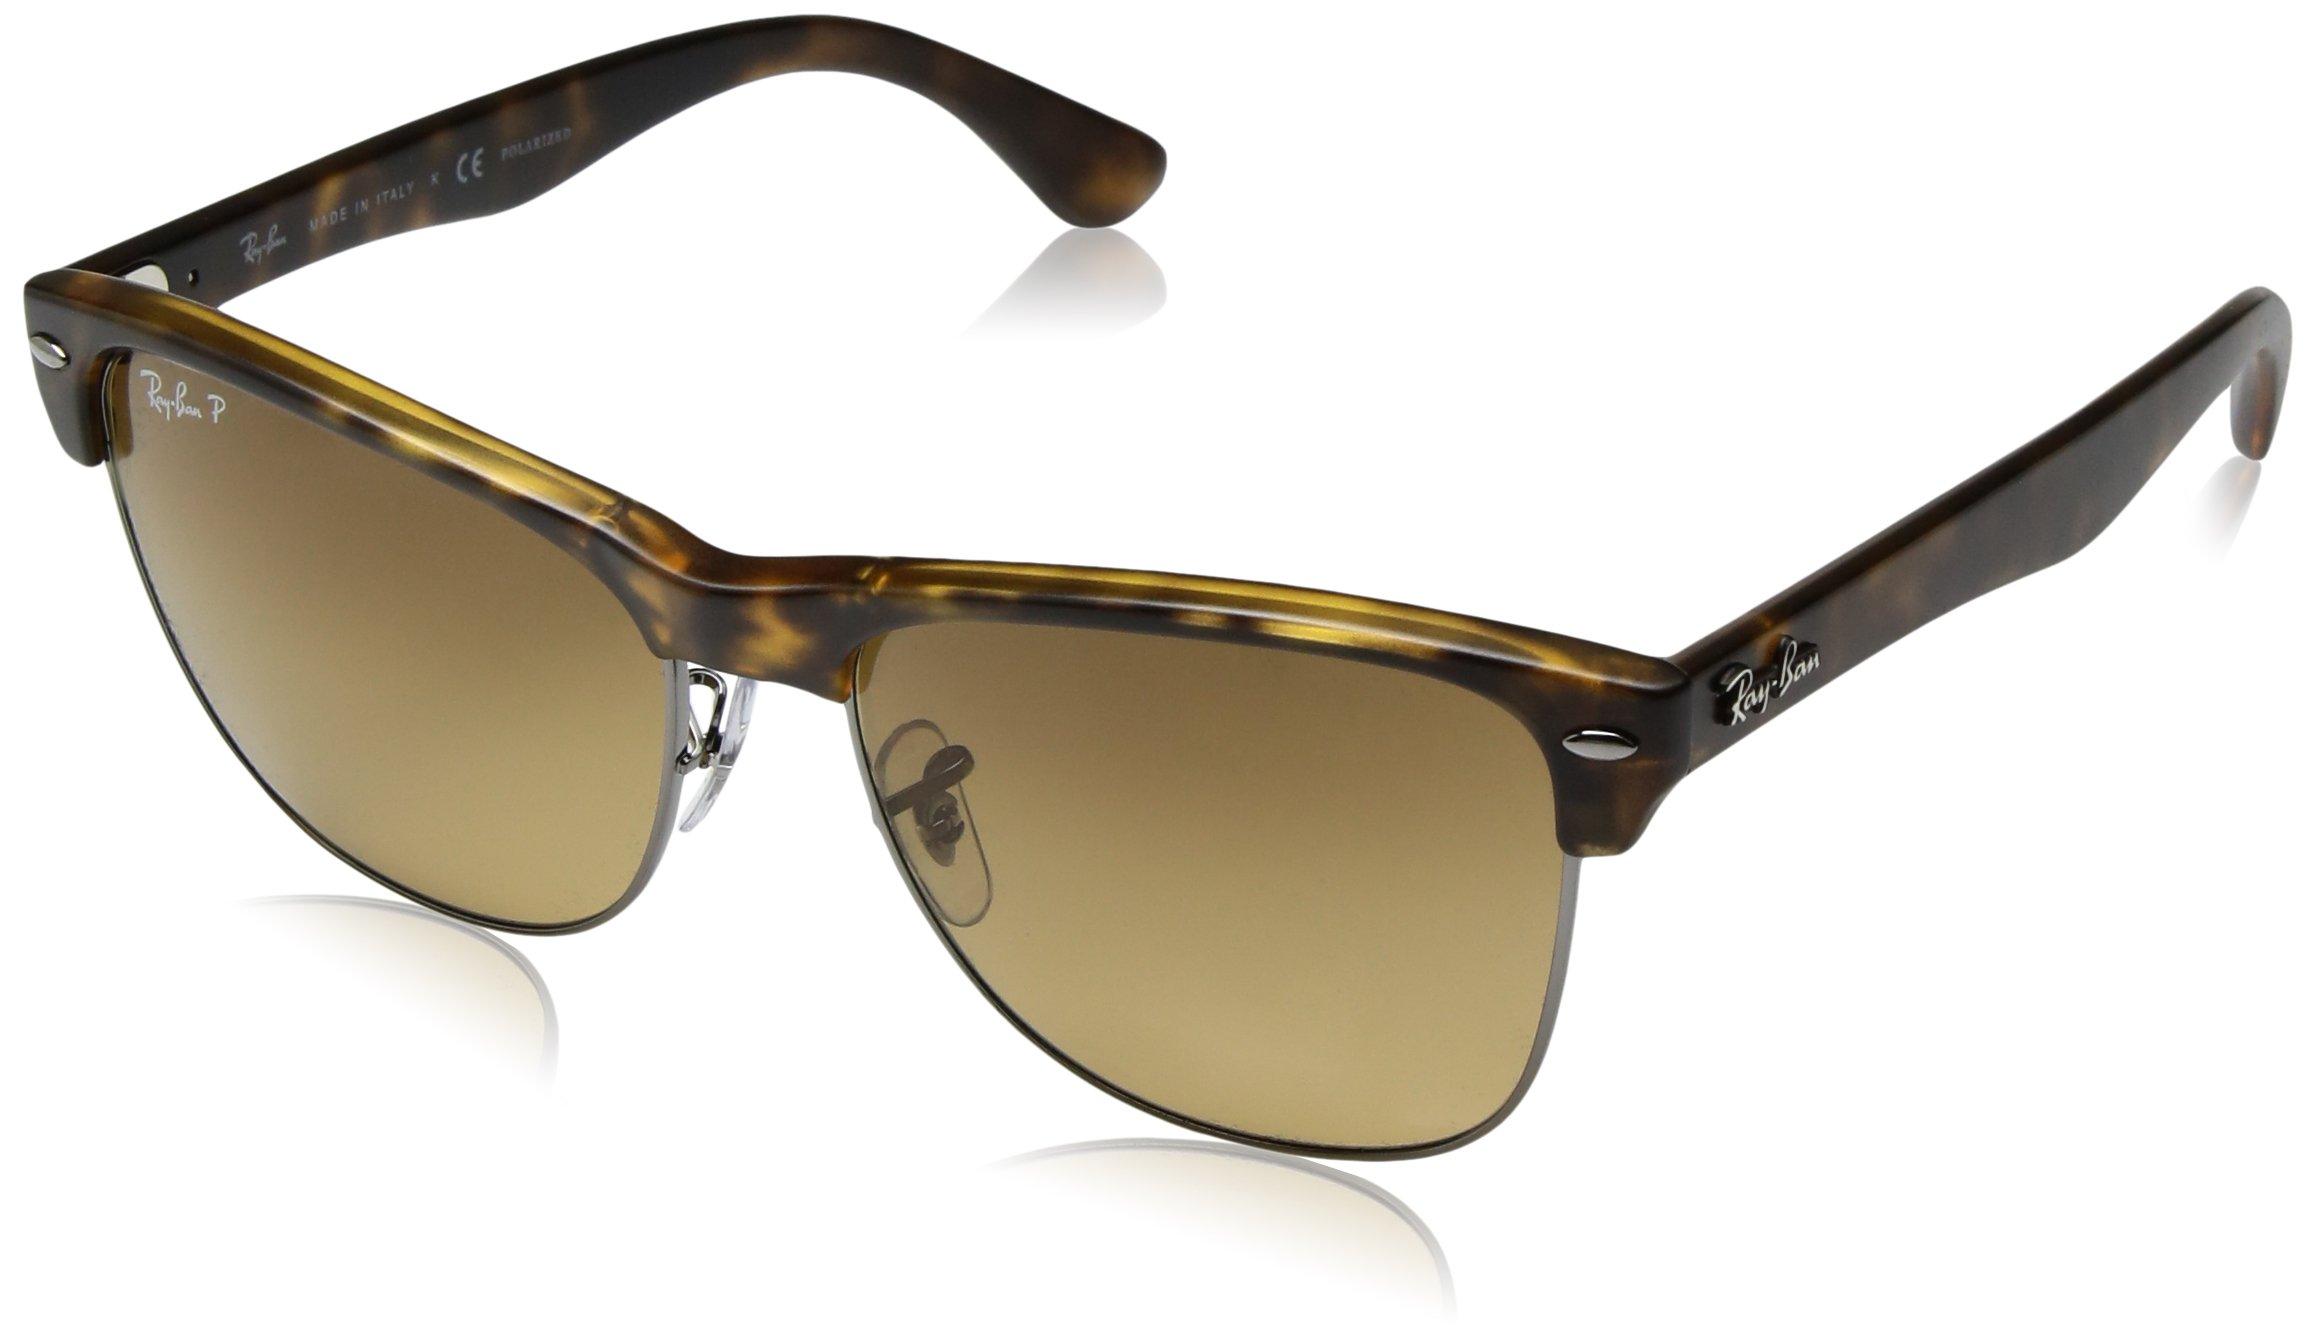 Ray-Ban Men's Clubmaster Oversized Polarized Square Sunglasses, Demi Gloss Havana, 57 mm